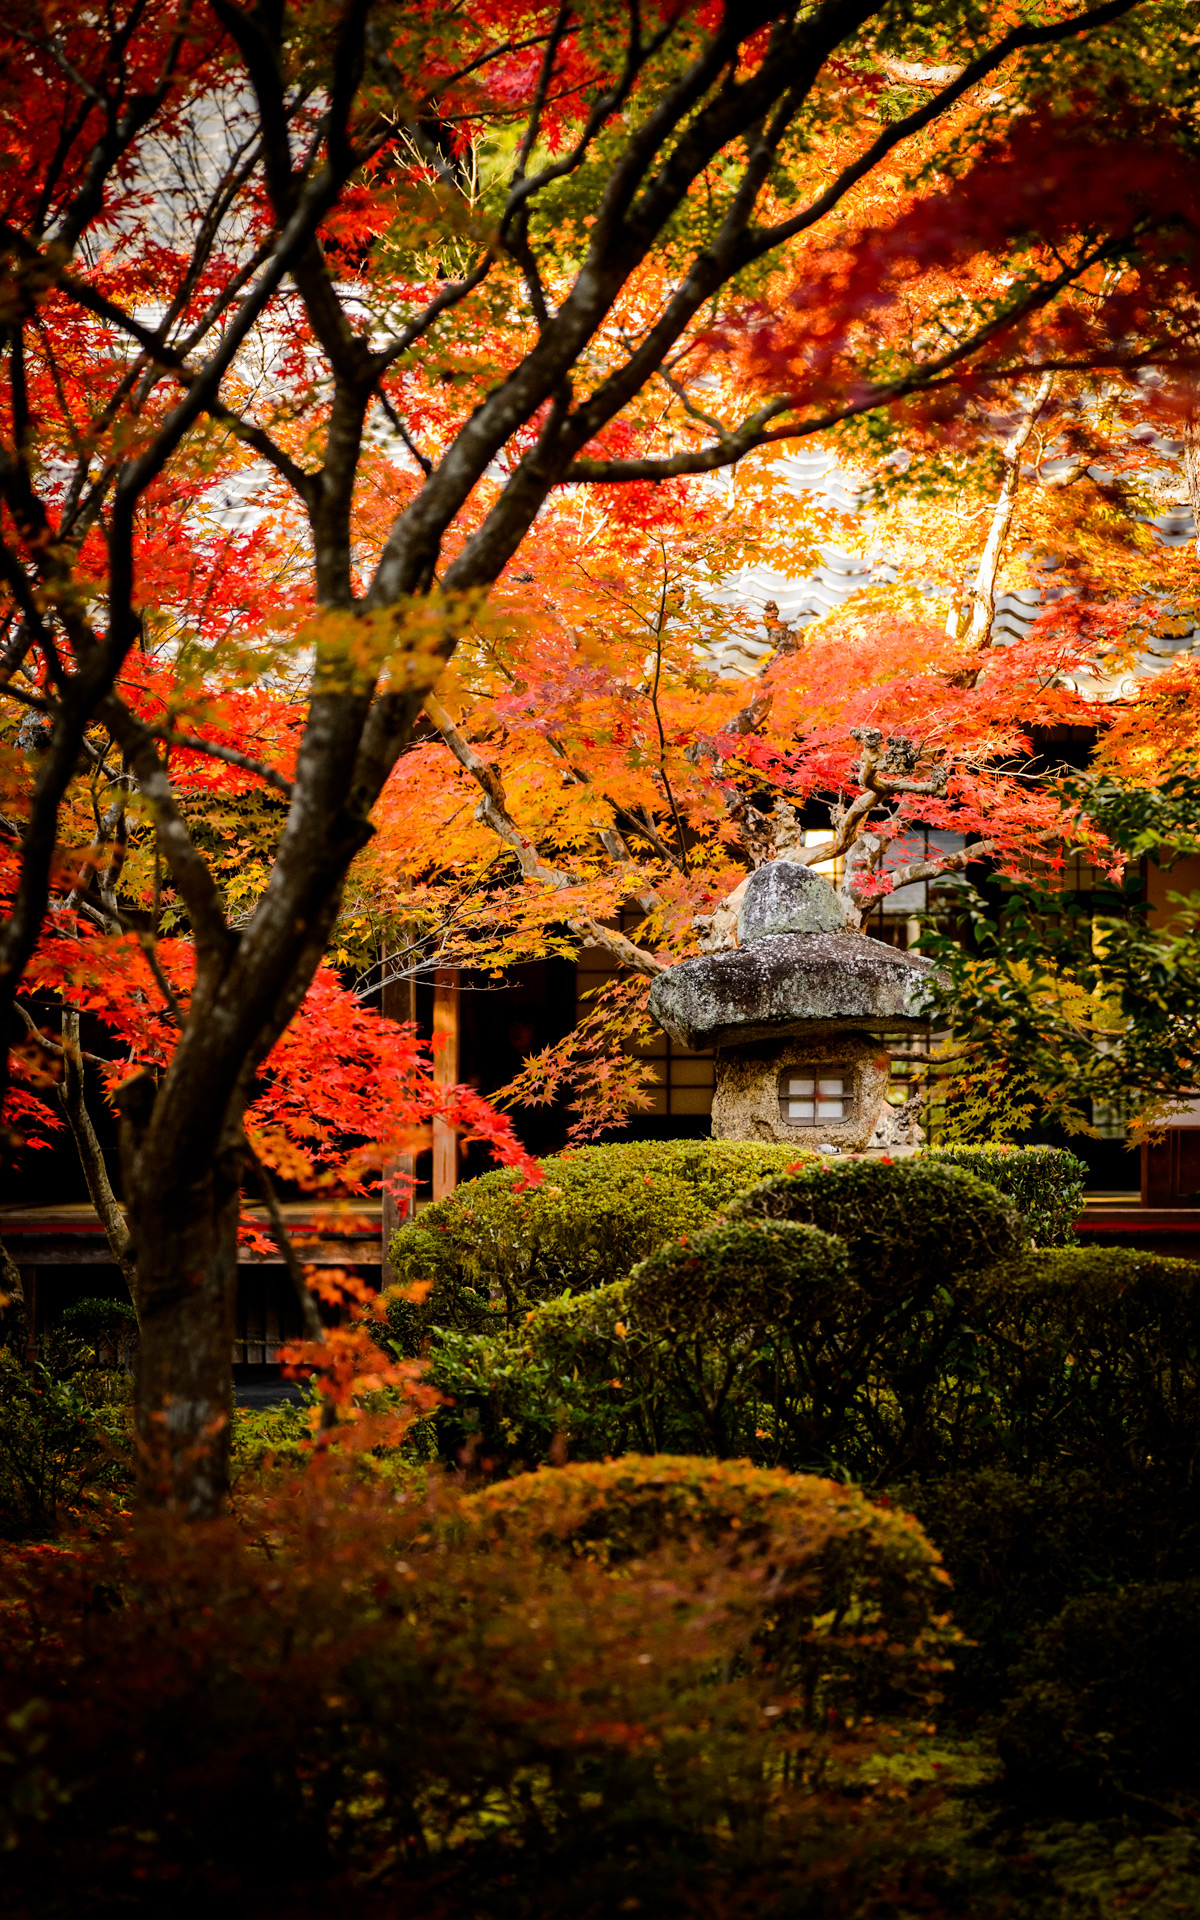 Desktop Wallpaper Fall Scenes Jeffrey Friedl S Blog 187 More Japanese Garden Desktop